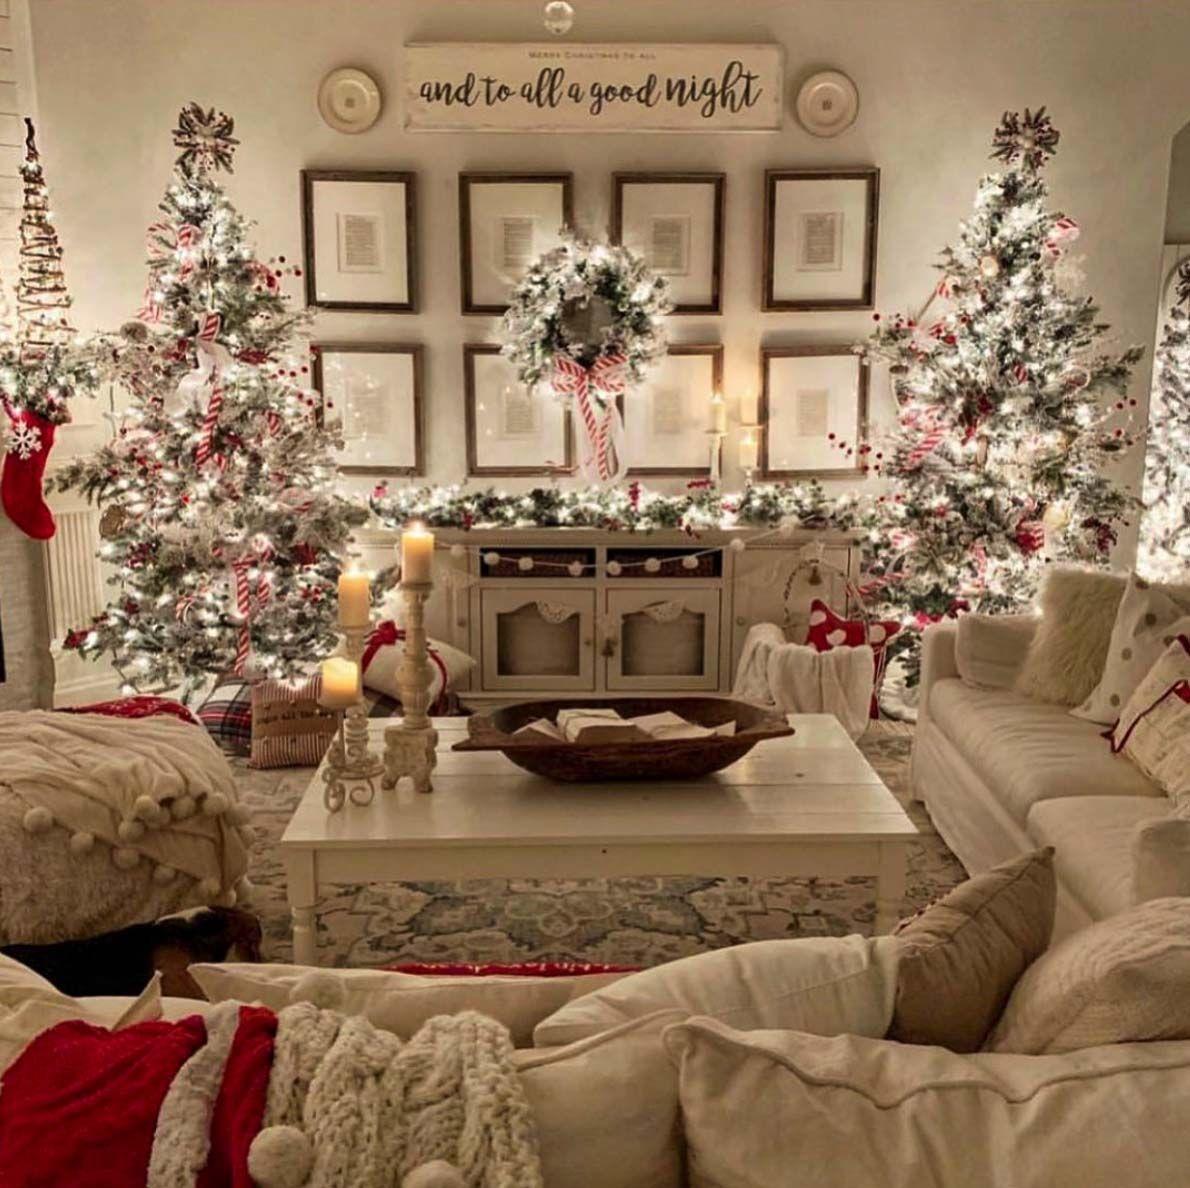 40 Cozy And Wonderful Rustic Farmhouse Christmas Decorating Ideas In 2020 Farmhouse Christmas Decor Christmas Decorations Living Room White Christmas Decor